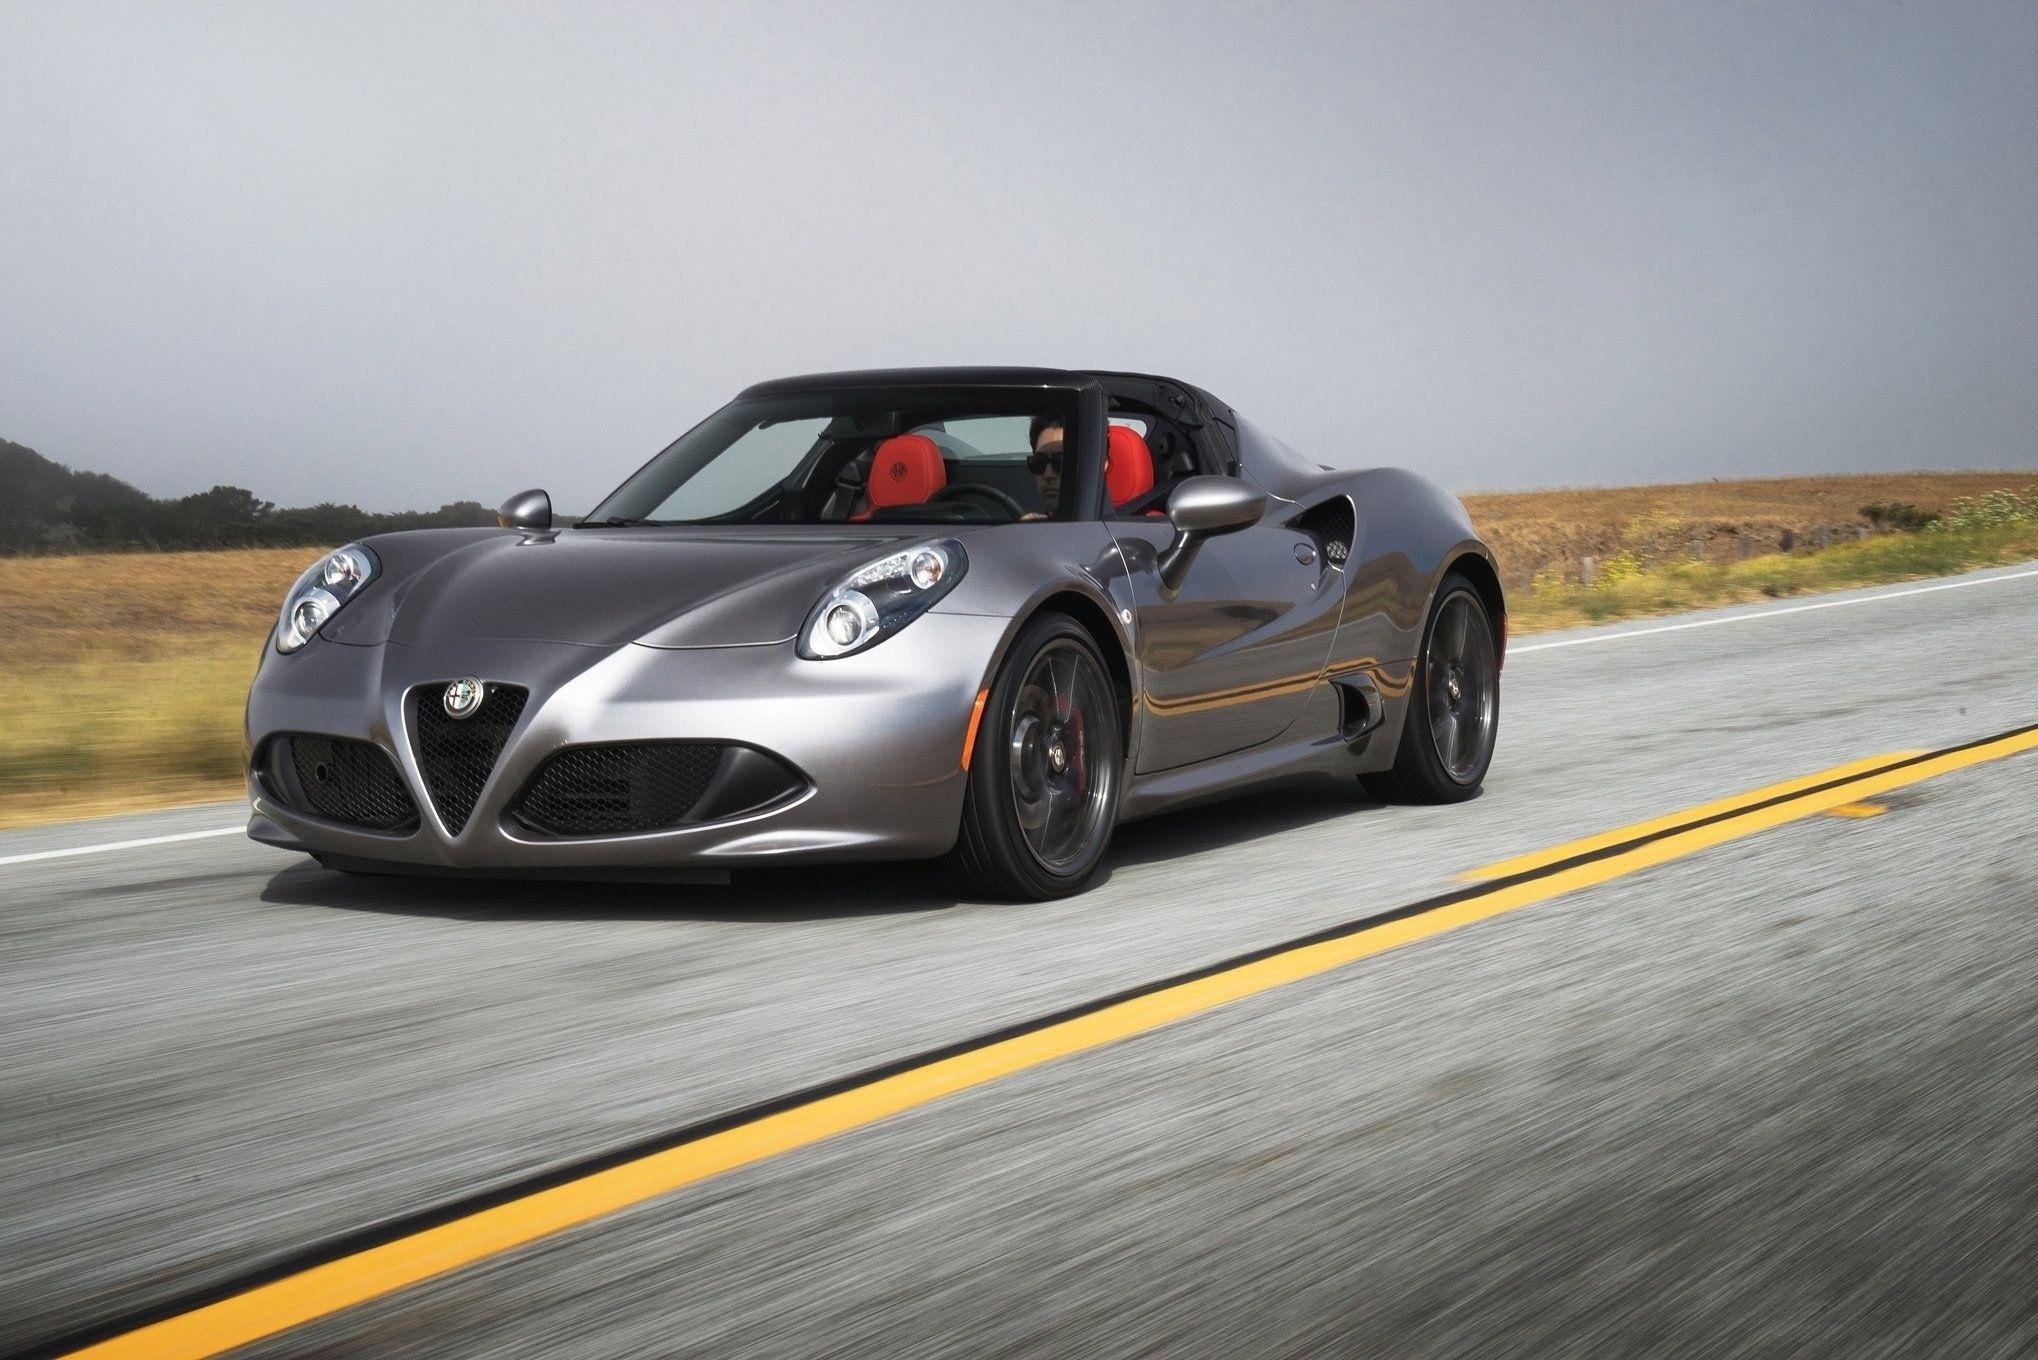 2019 Alfa Romeo 4c Spider Overview And Price Alfa Romeo 4c Alfa Romeo Alfa Romeo Cars